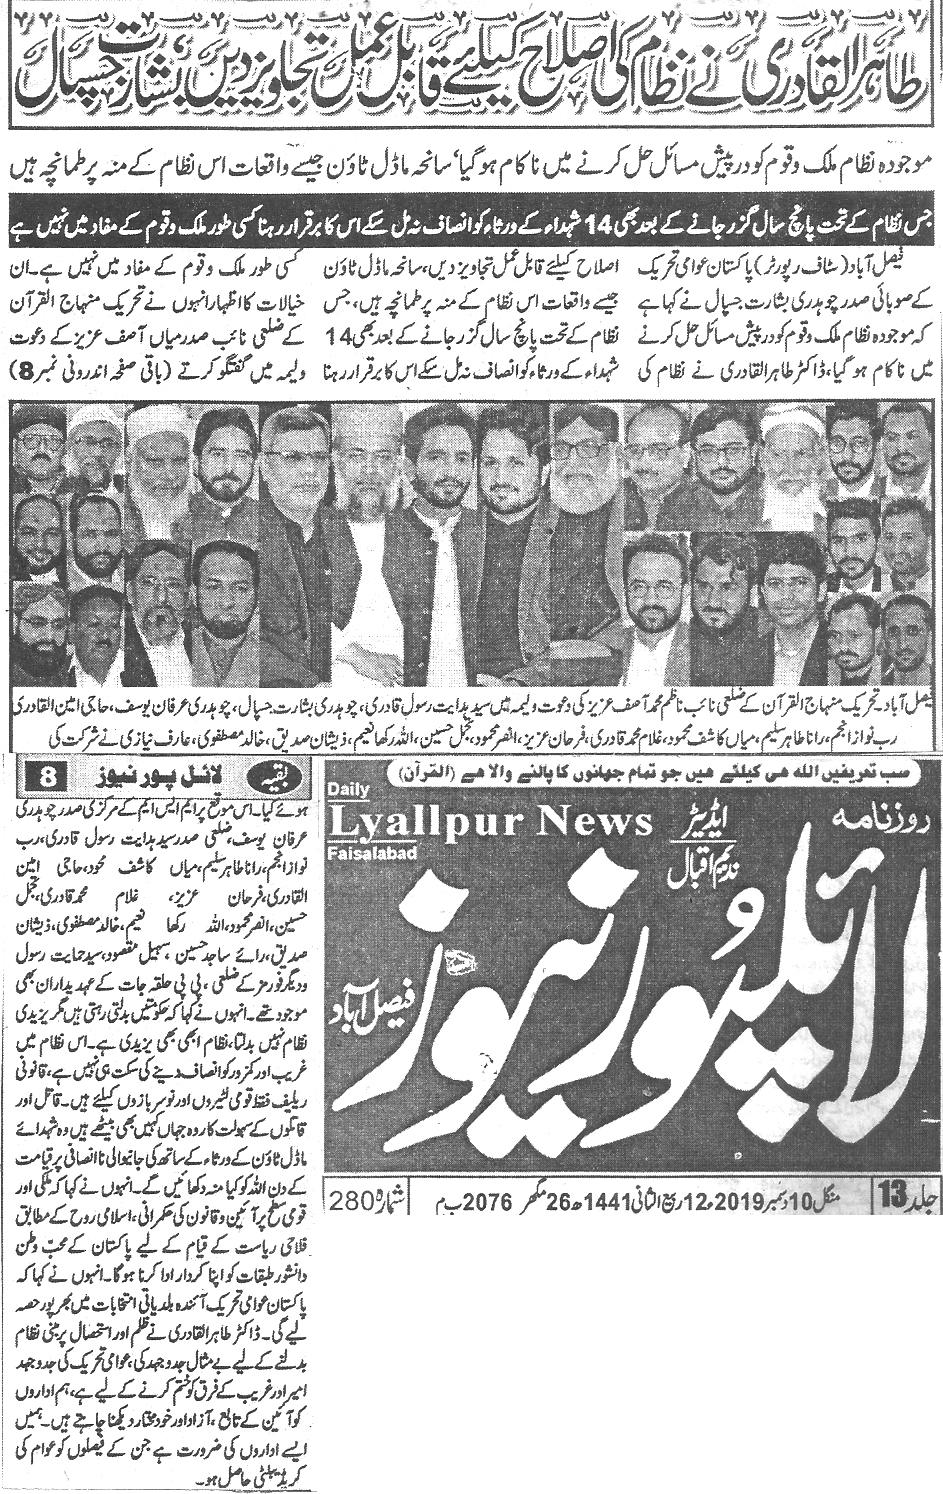 Pakistan Awami Tehreek  Print Media Coverage Daily Lyallpur News page 4